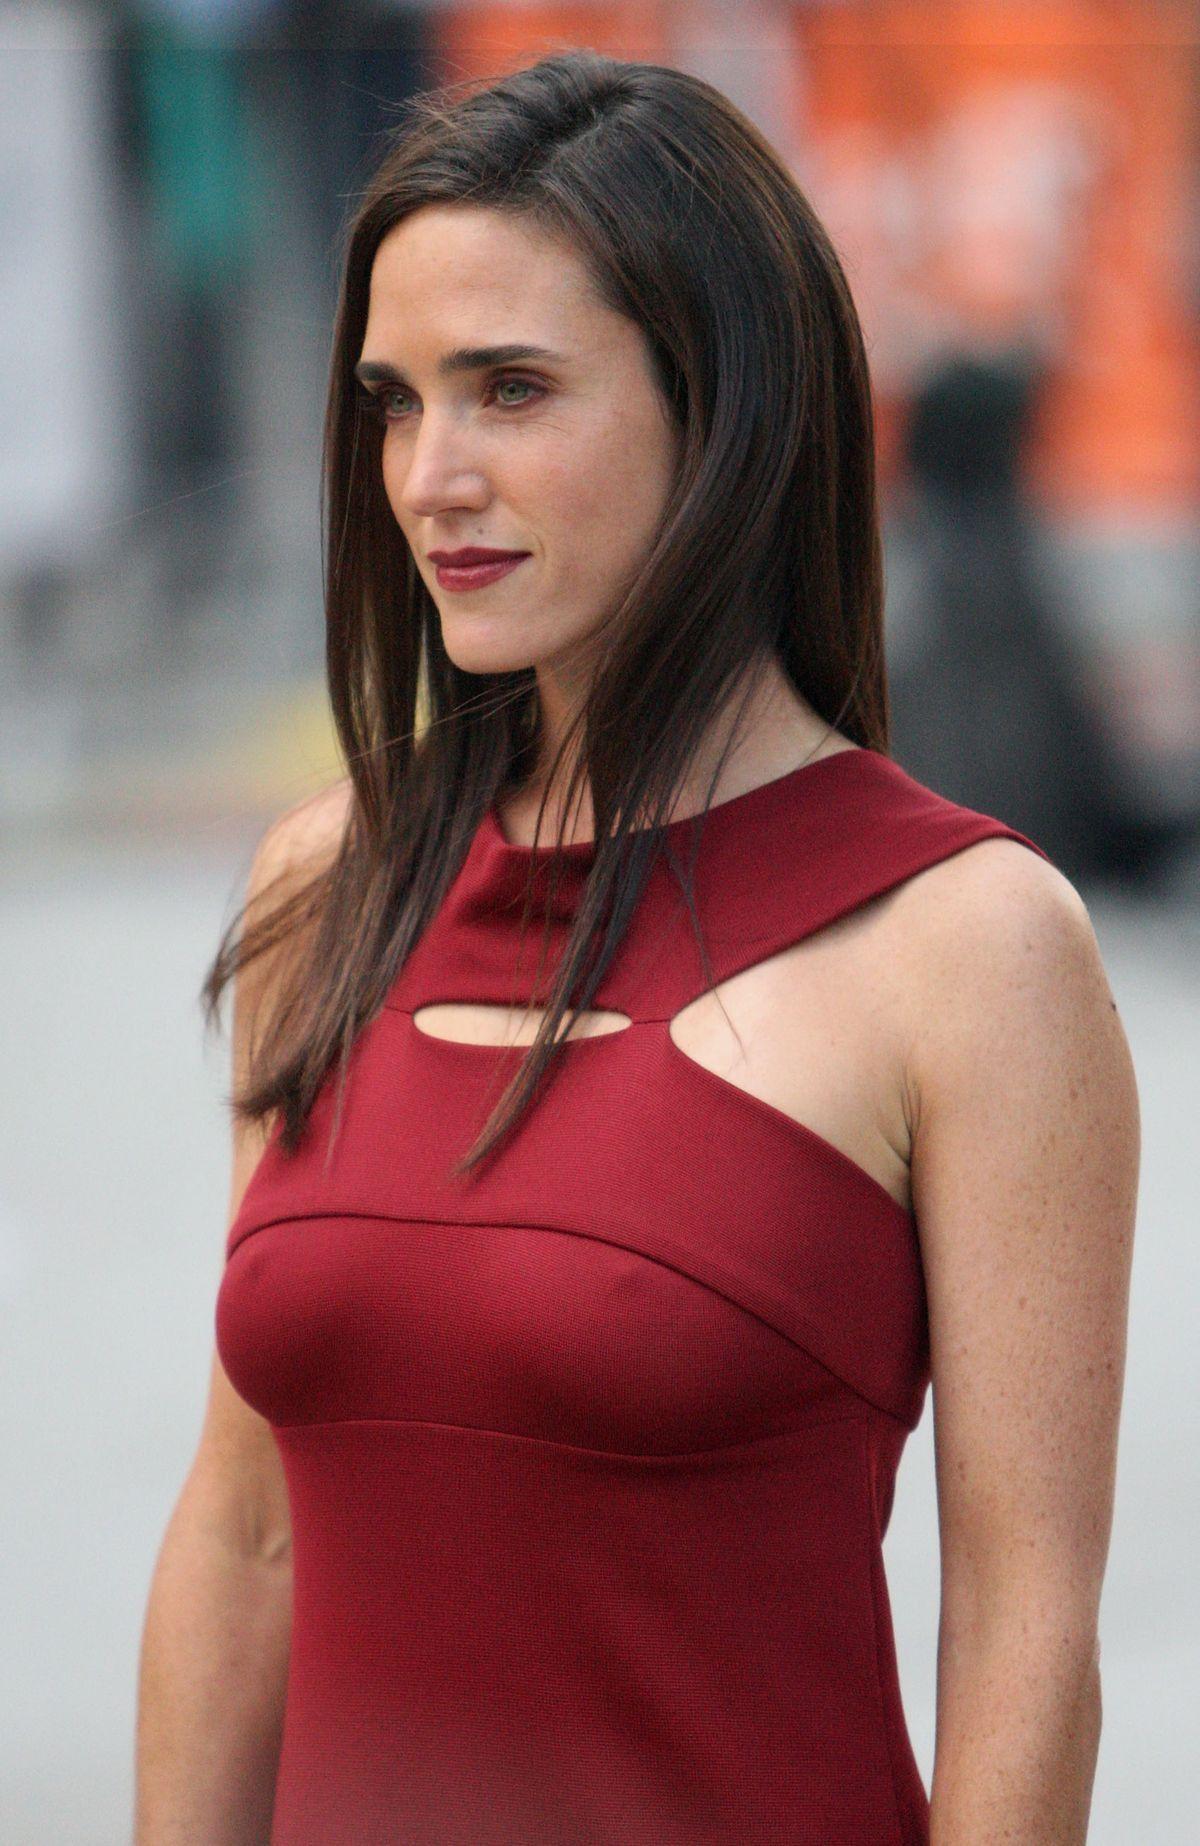 Jennifer sexy female star